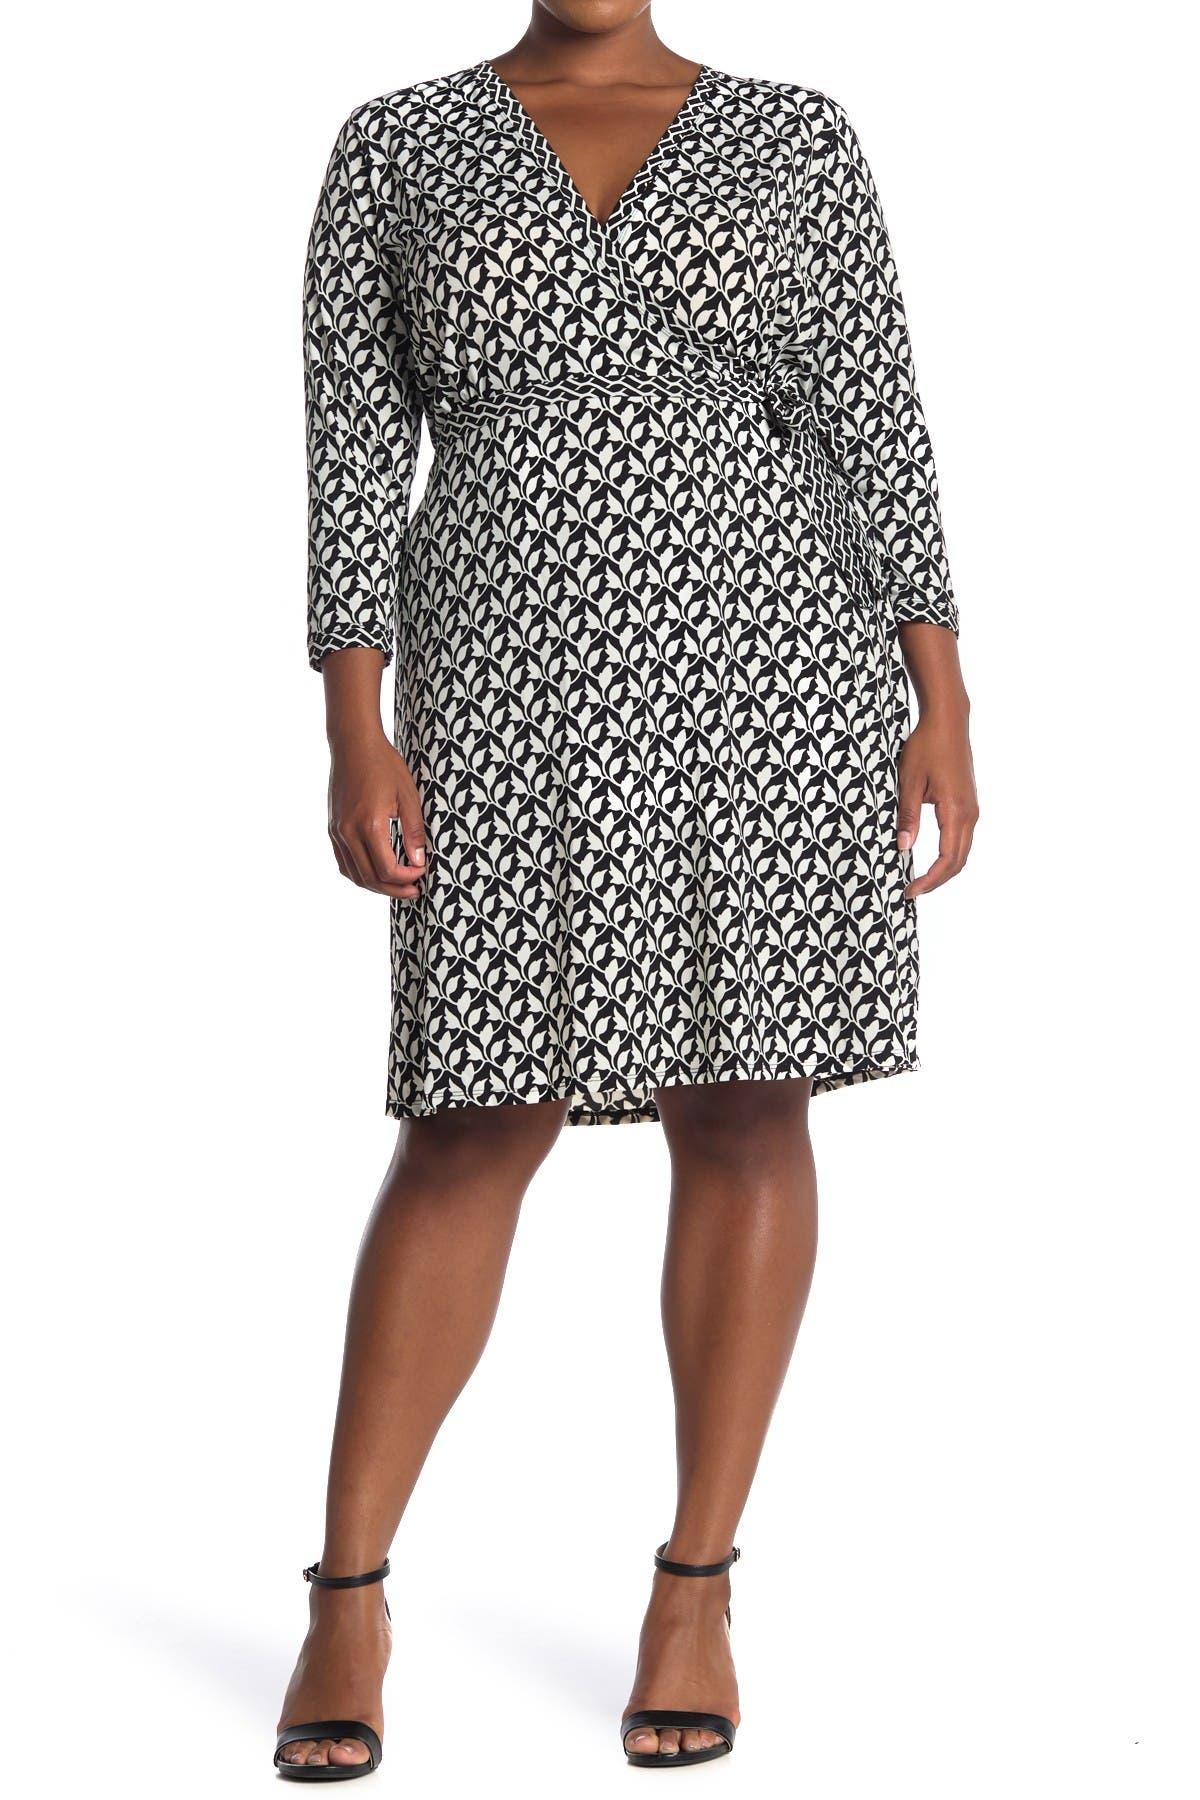 Image of Max Studio Floral Knee Length Wrap Dress